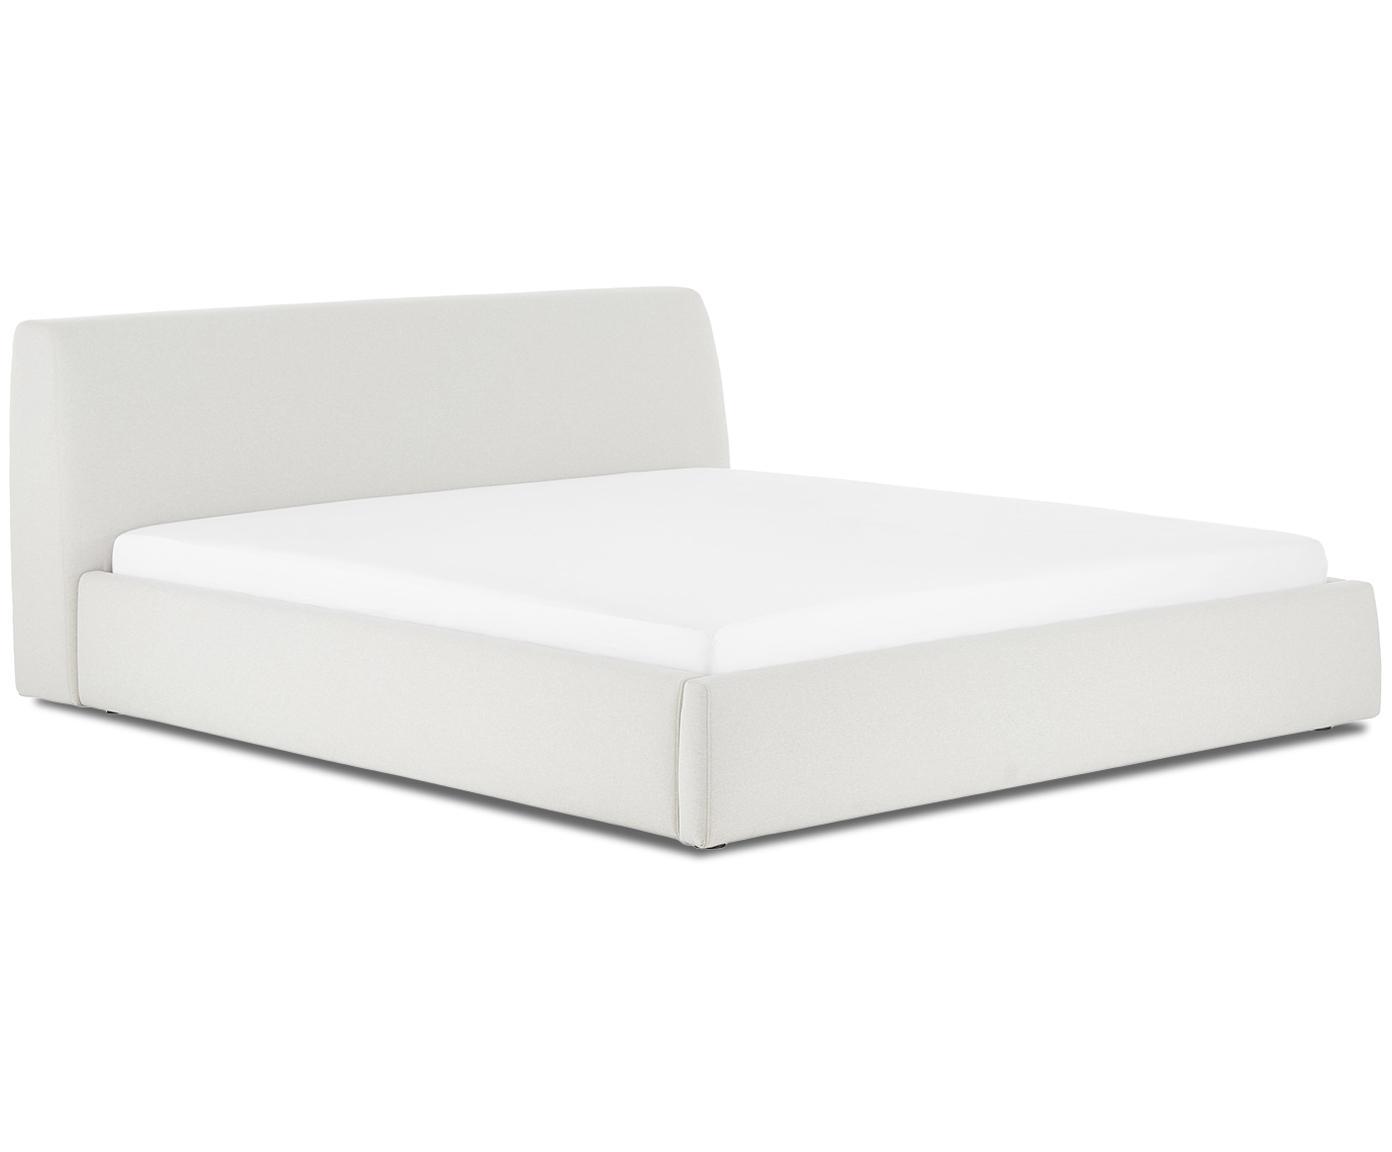 Gestoffeerd bed Cloud, Frame: massief grenenhout, Bekleding: polyester (structuurstof), Beige, 180 x 200 cm